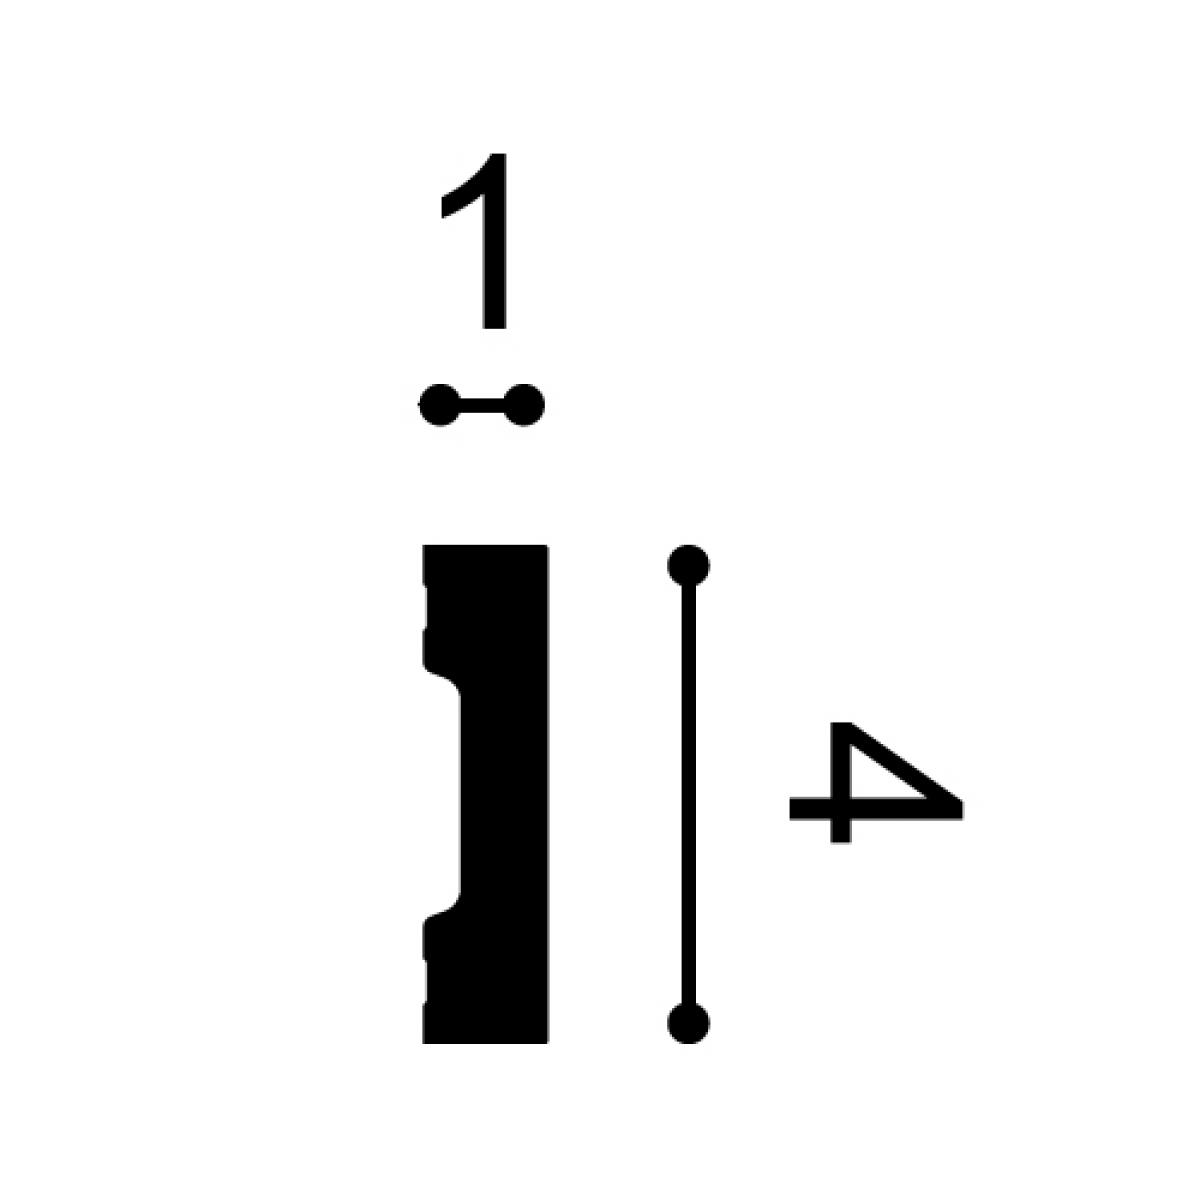 Ancadrament Usa Axxent DX162-2300, Dimensiuni: 230 X 4 X 1 cm, Orac Decor